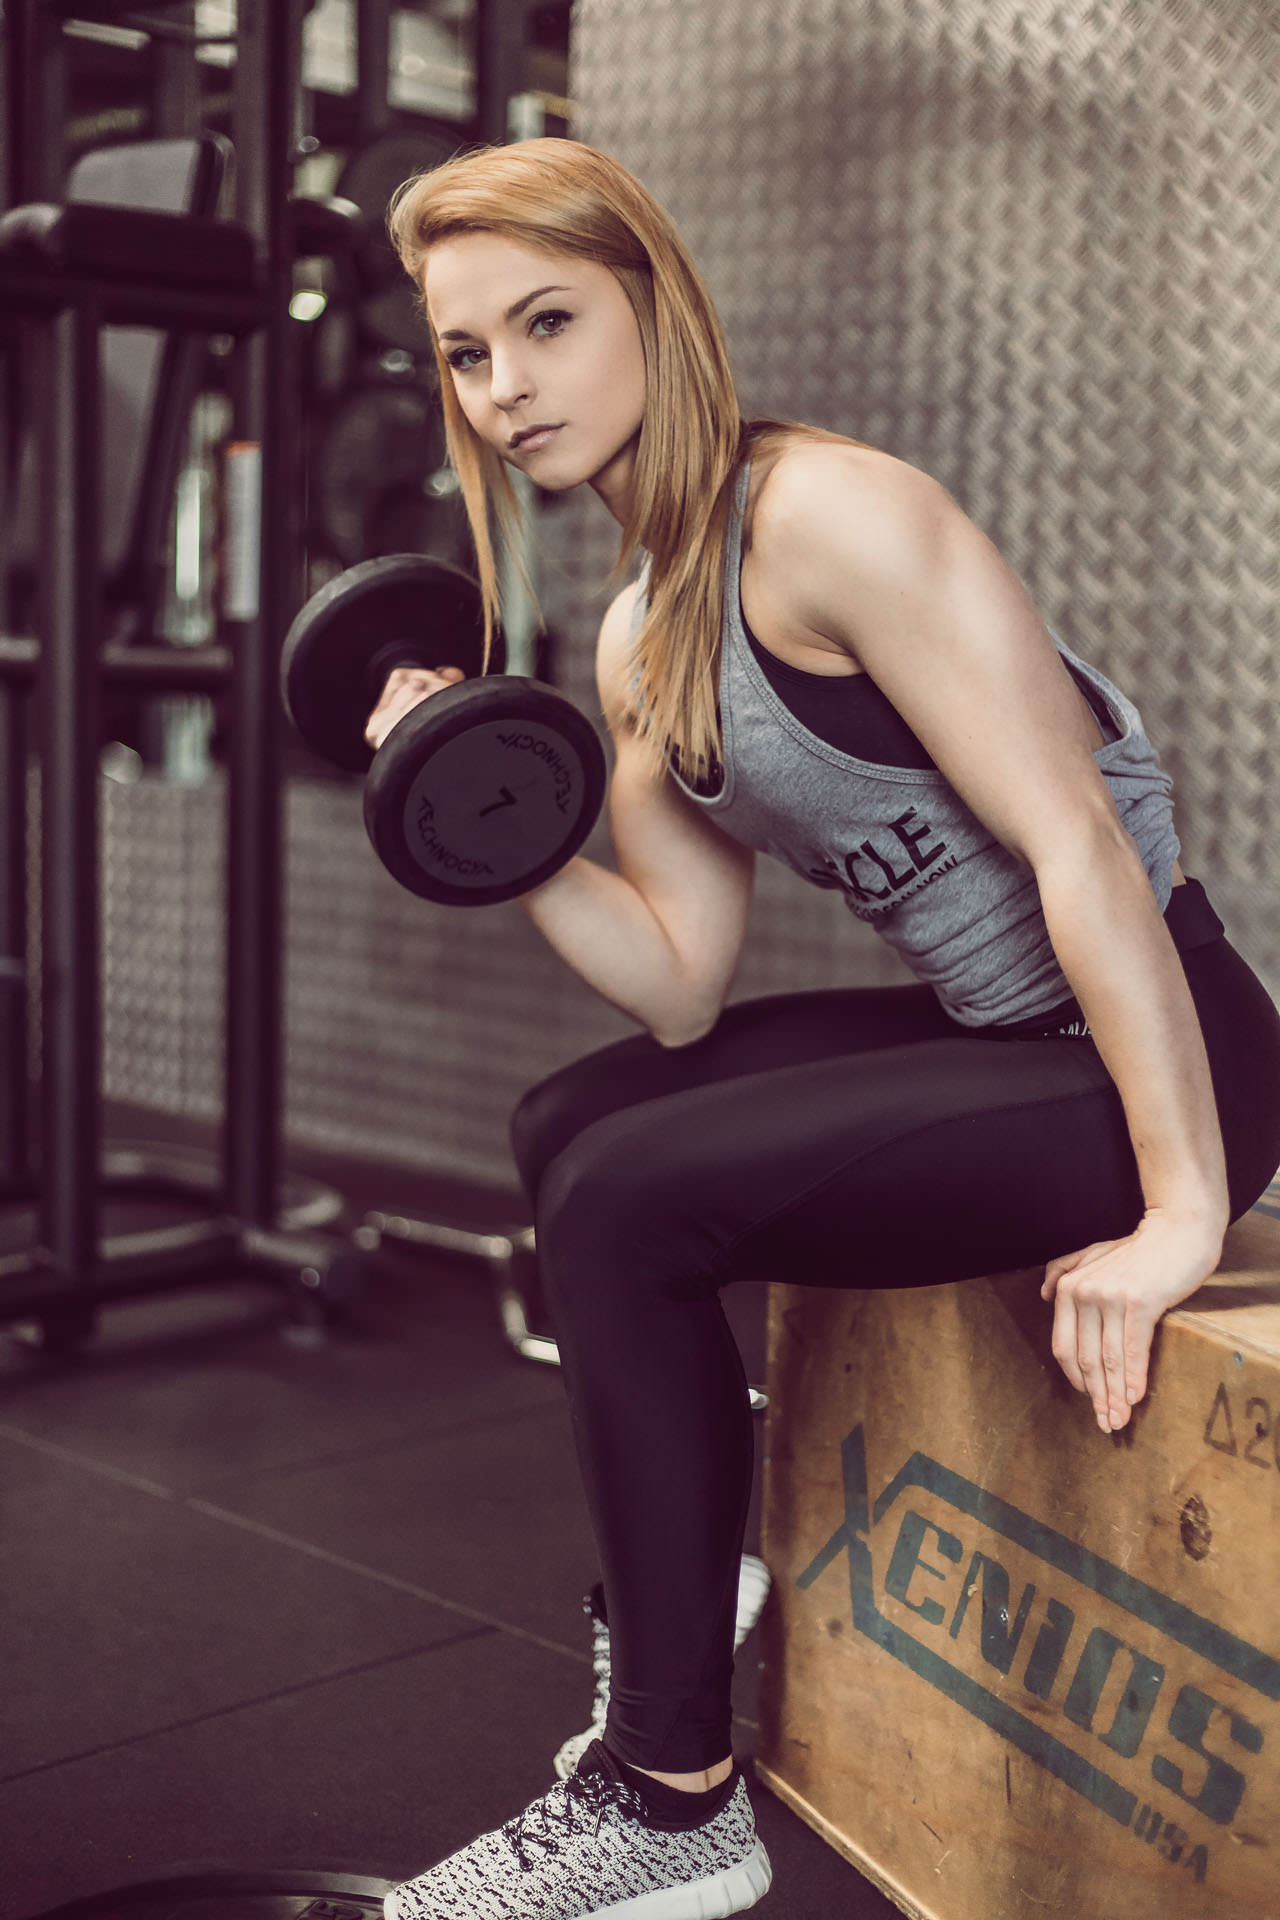 2017-02-24 - Stessie LittleBirds - MyMuscle - FitnessPark - 3207 - 1920px